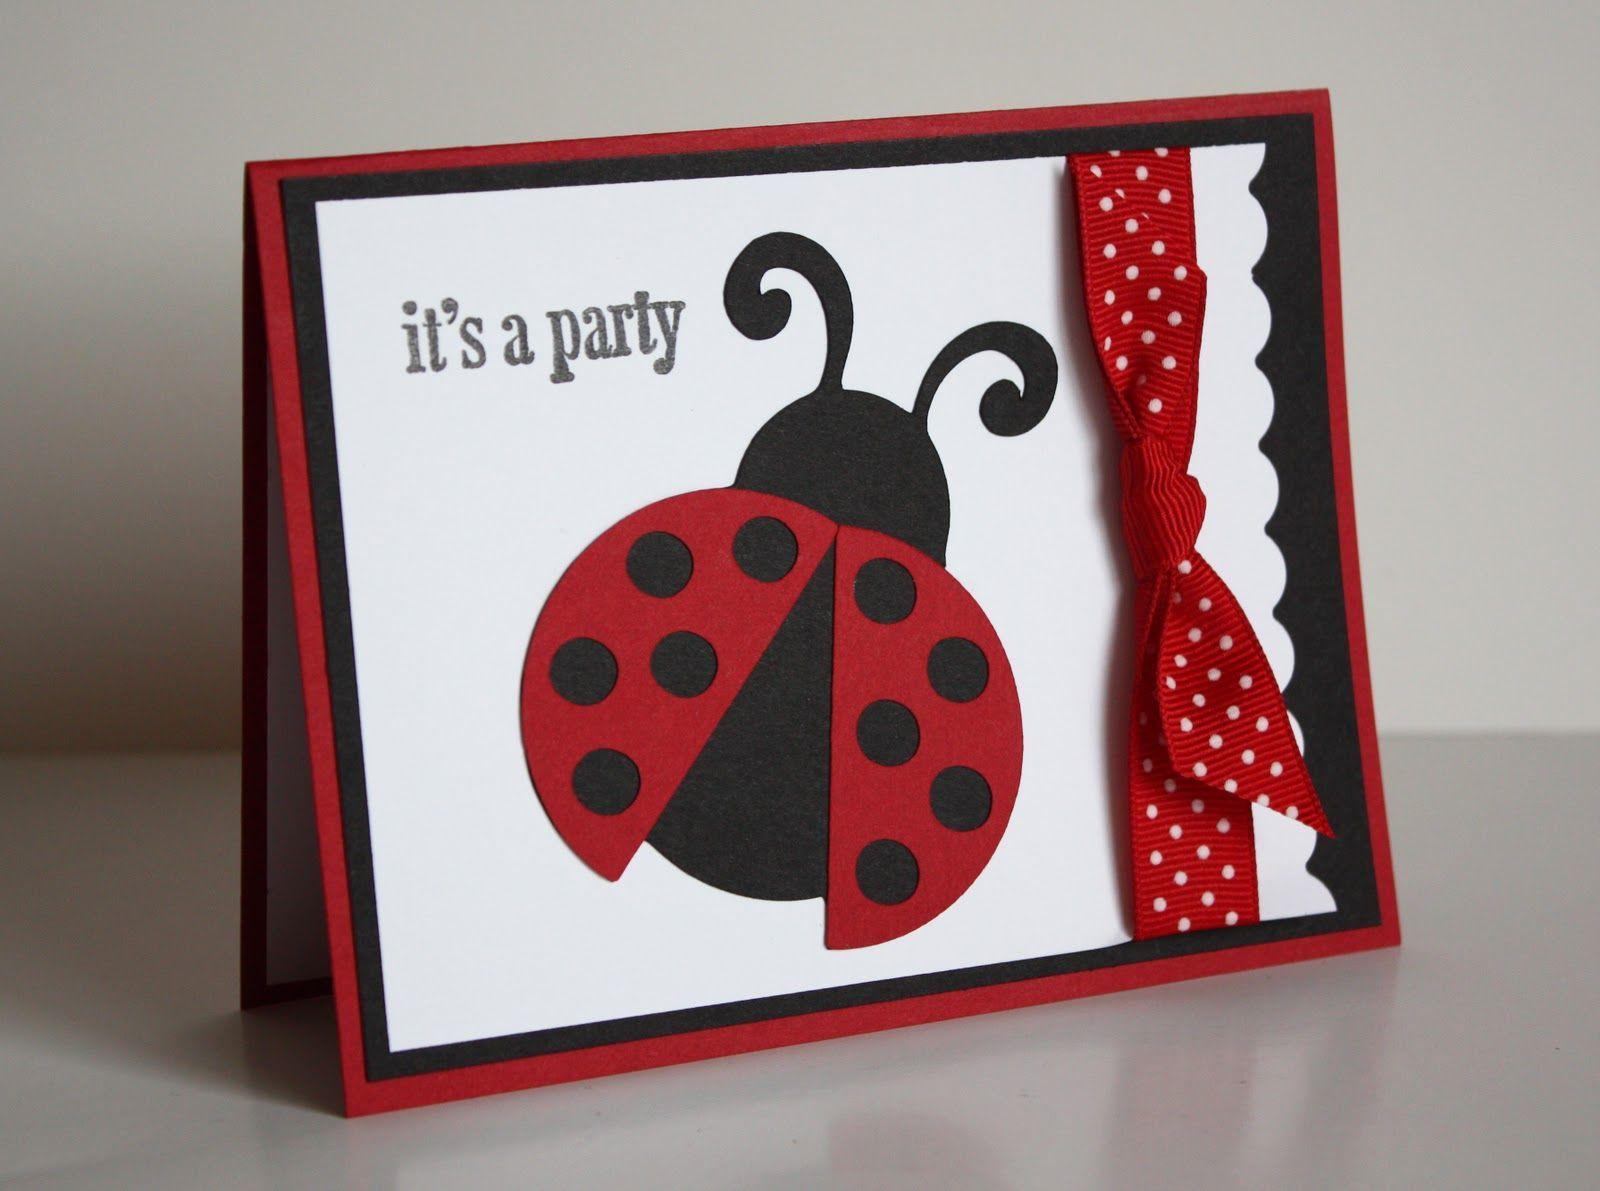 ladybug birthday wishes | Ladybug Birthday Party Set | Erin ...